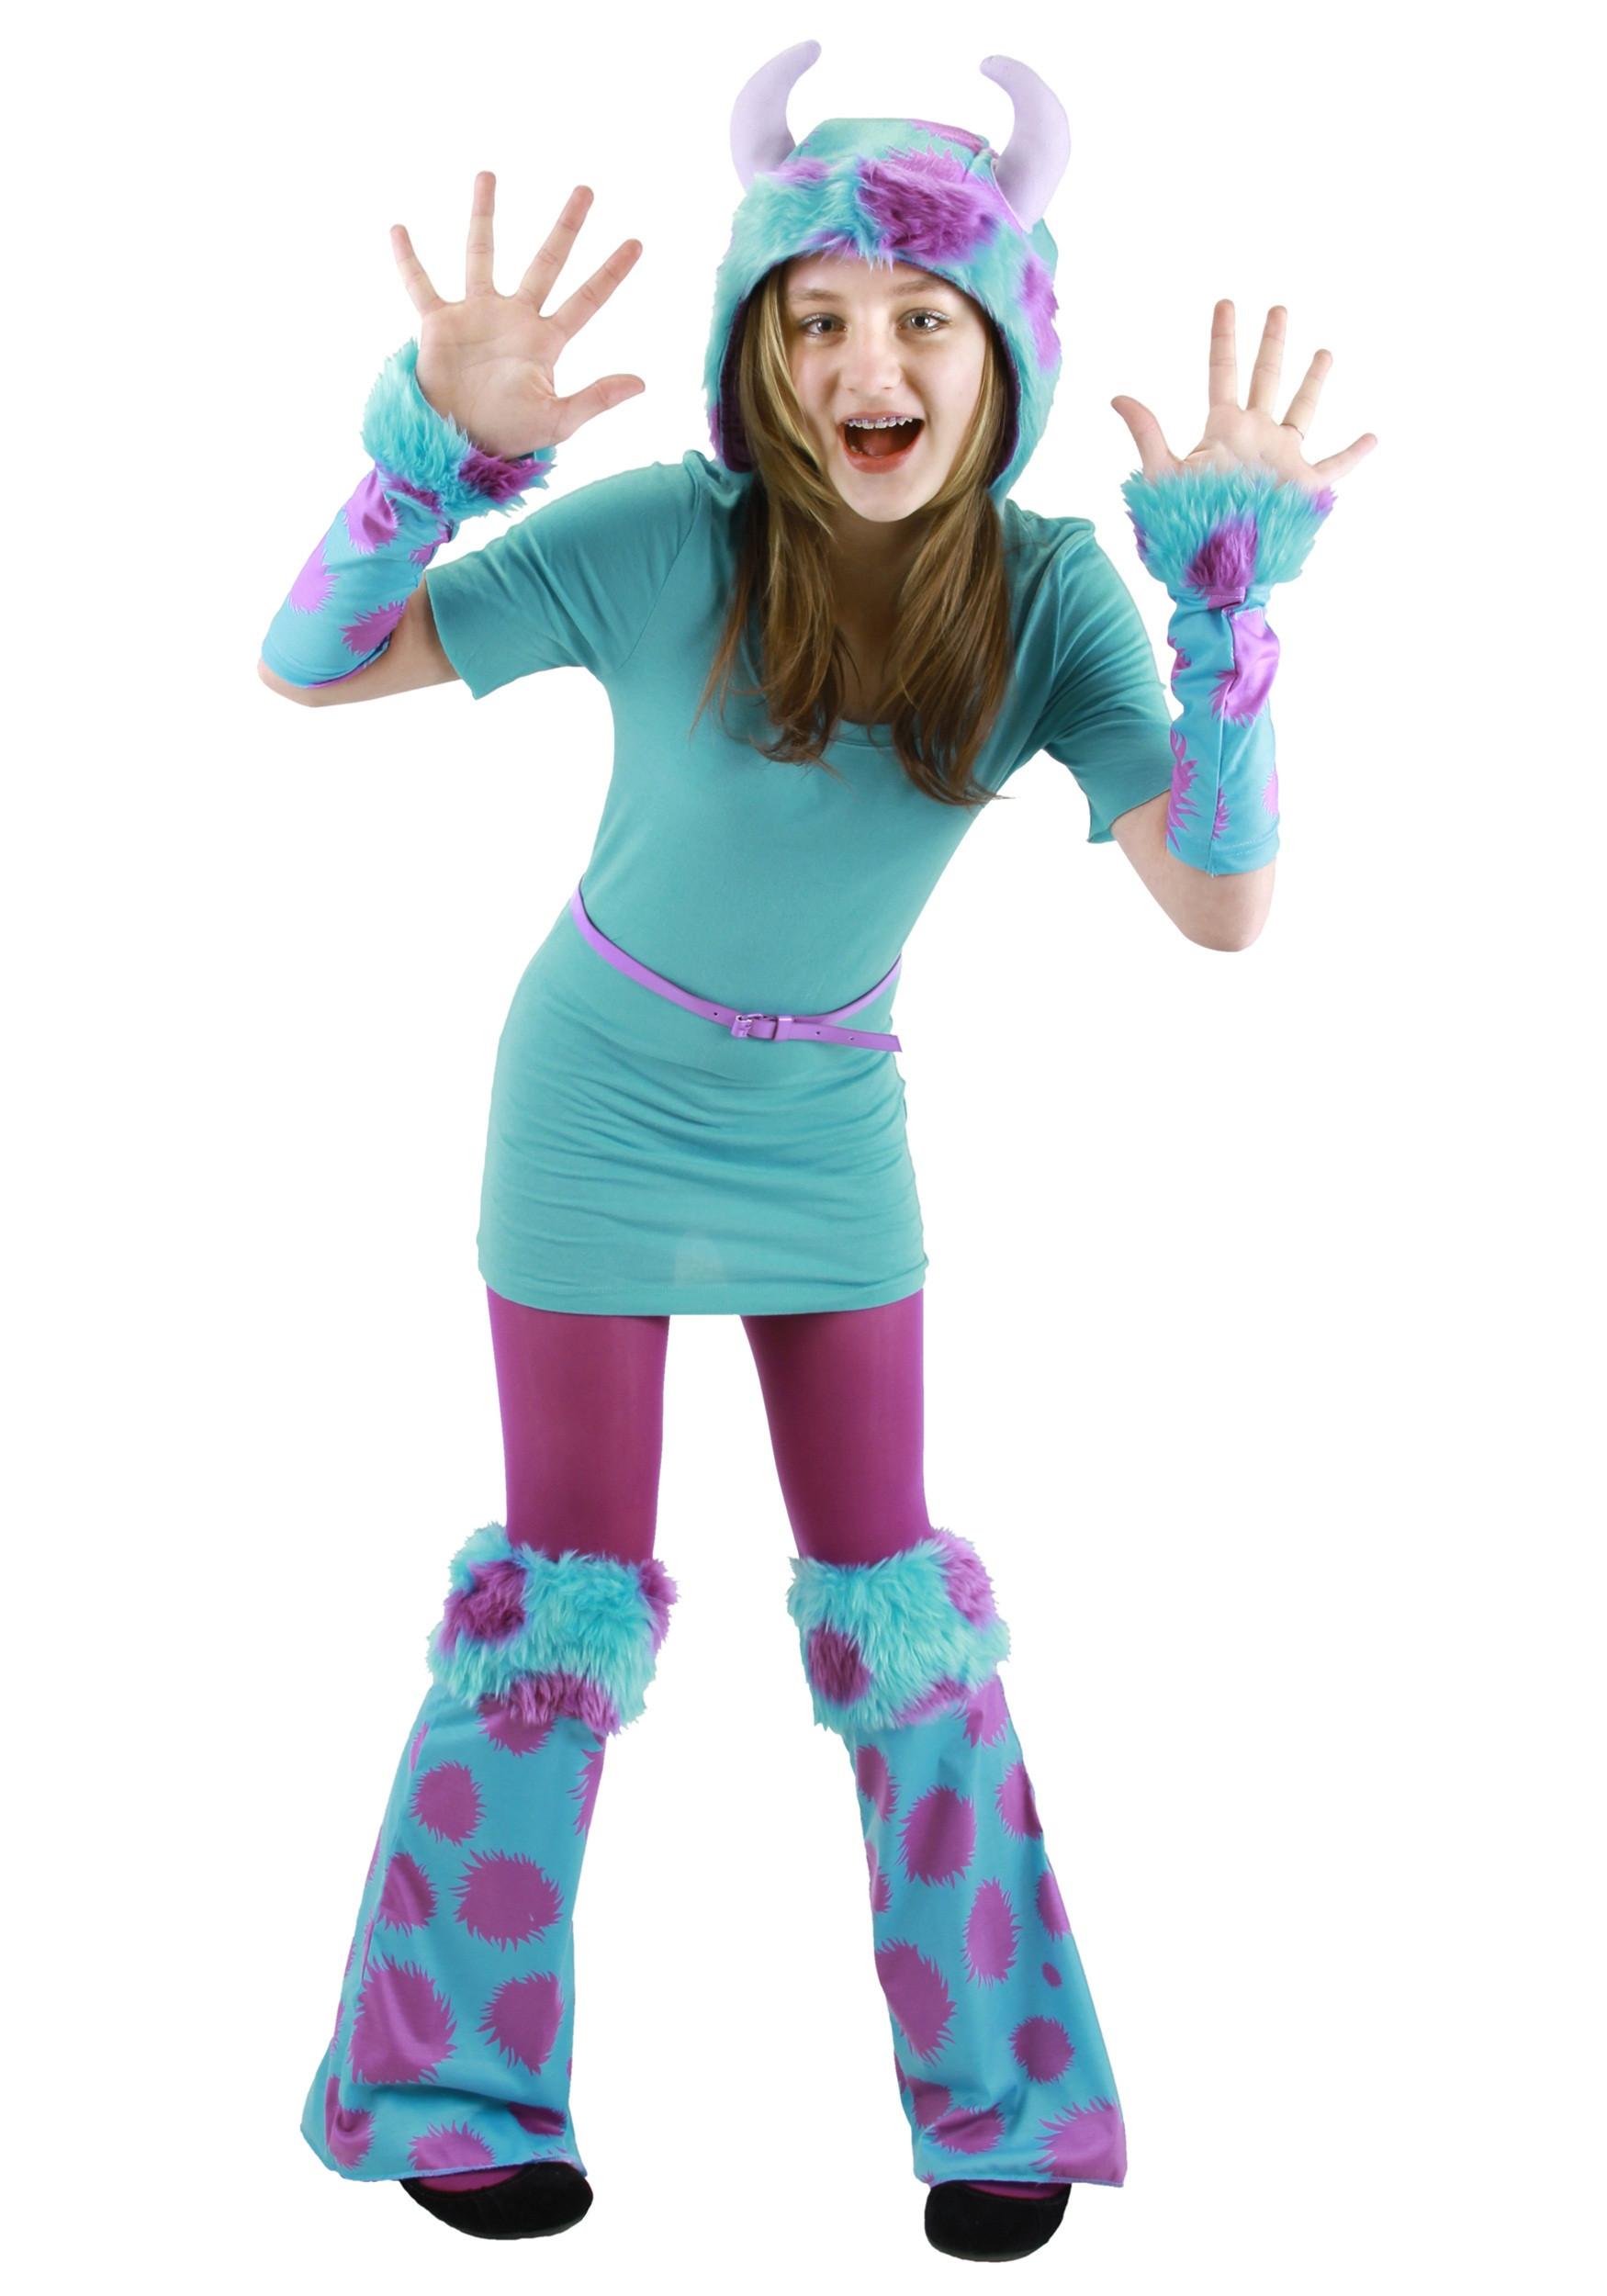 DIY Monsters Inc Costume  Sully Costumes for Men Women Kids